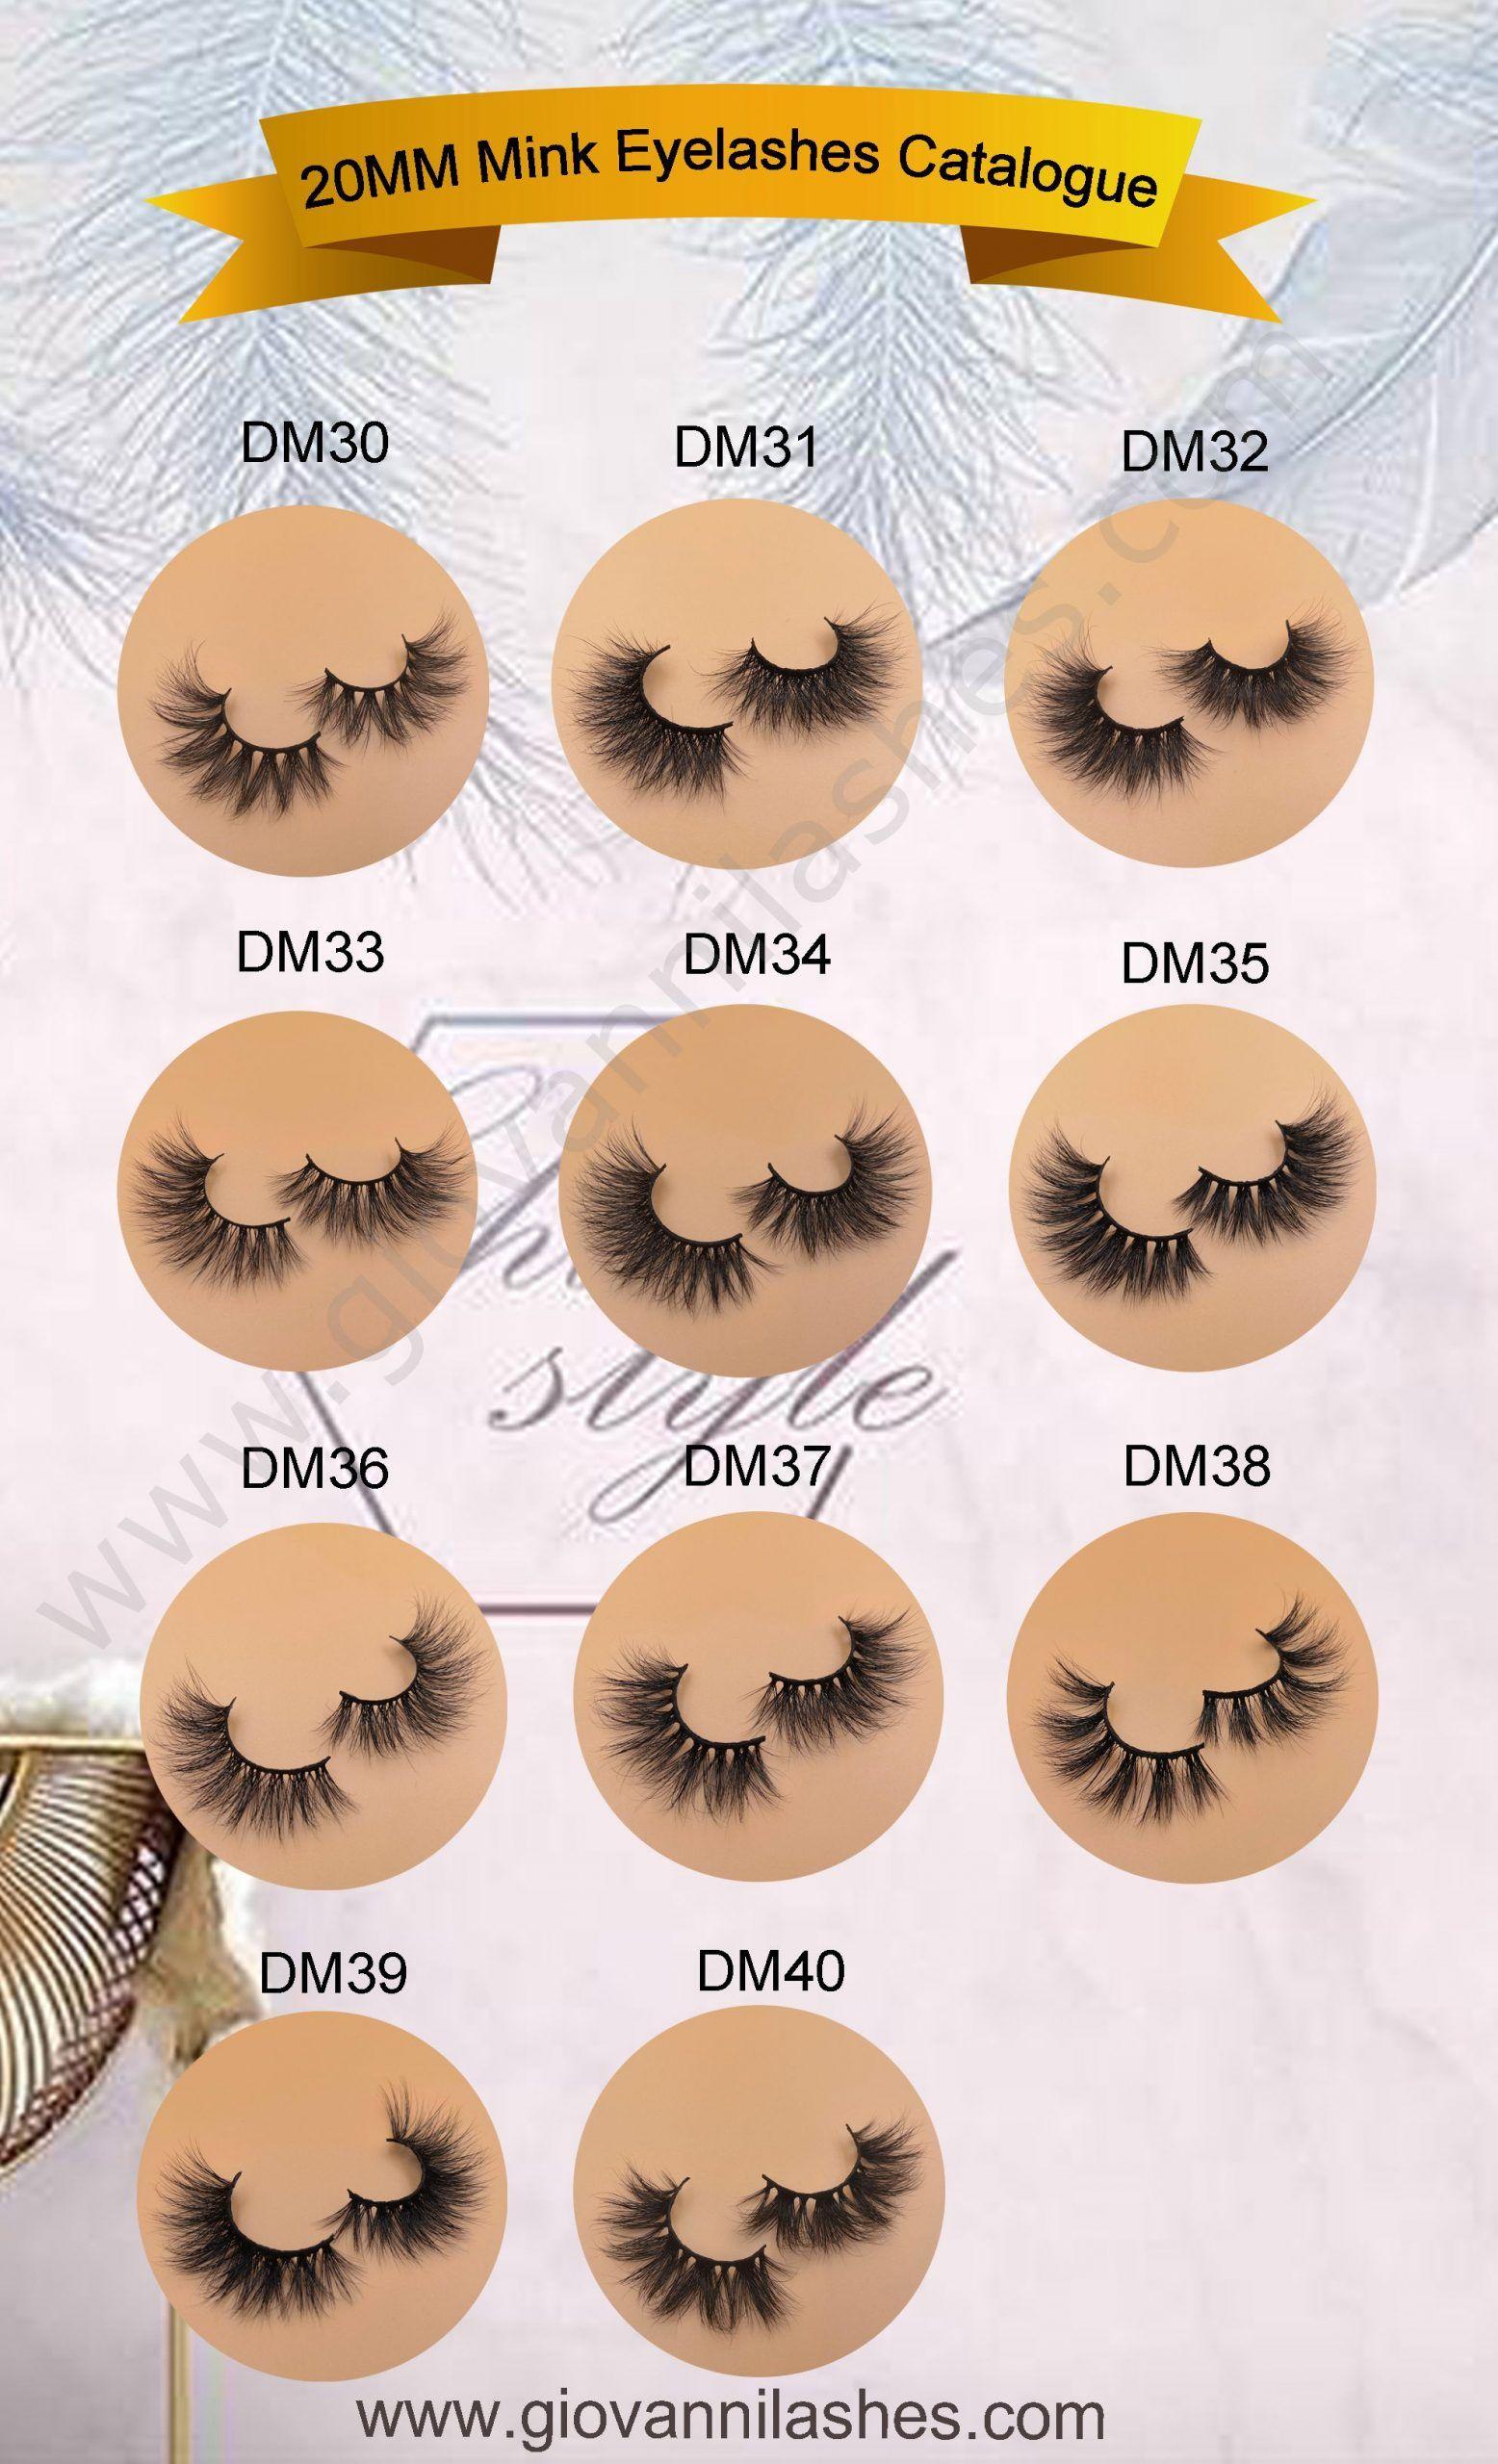 20 mm Mink Lashes in 2020 Mink lashes, Mink eyelashes